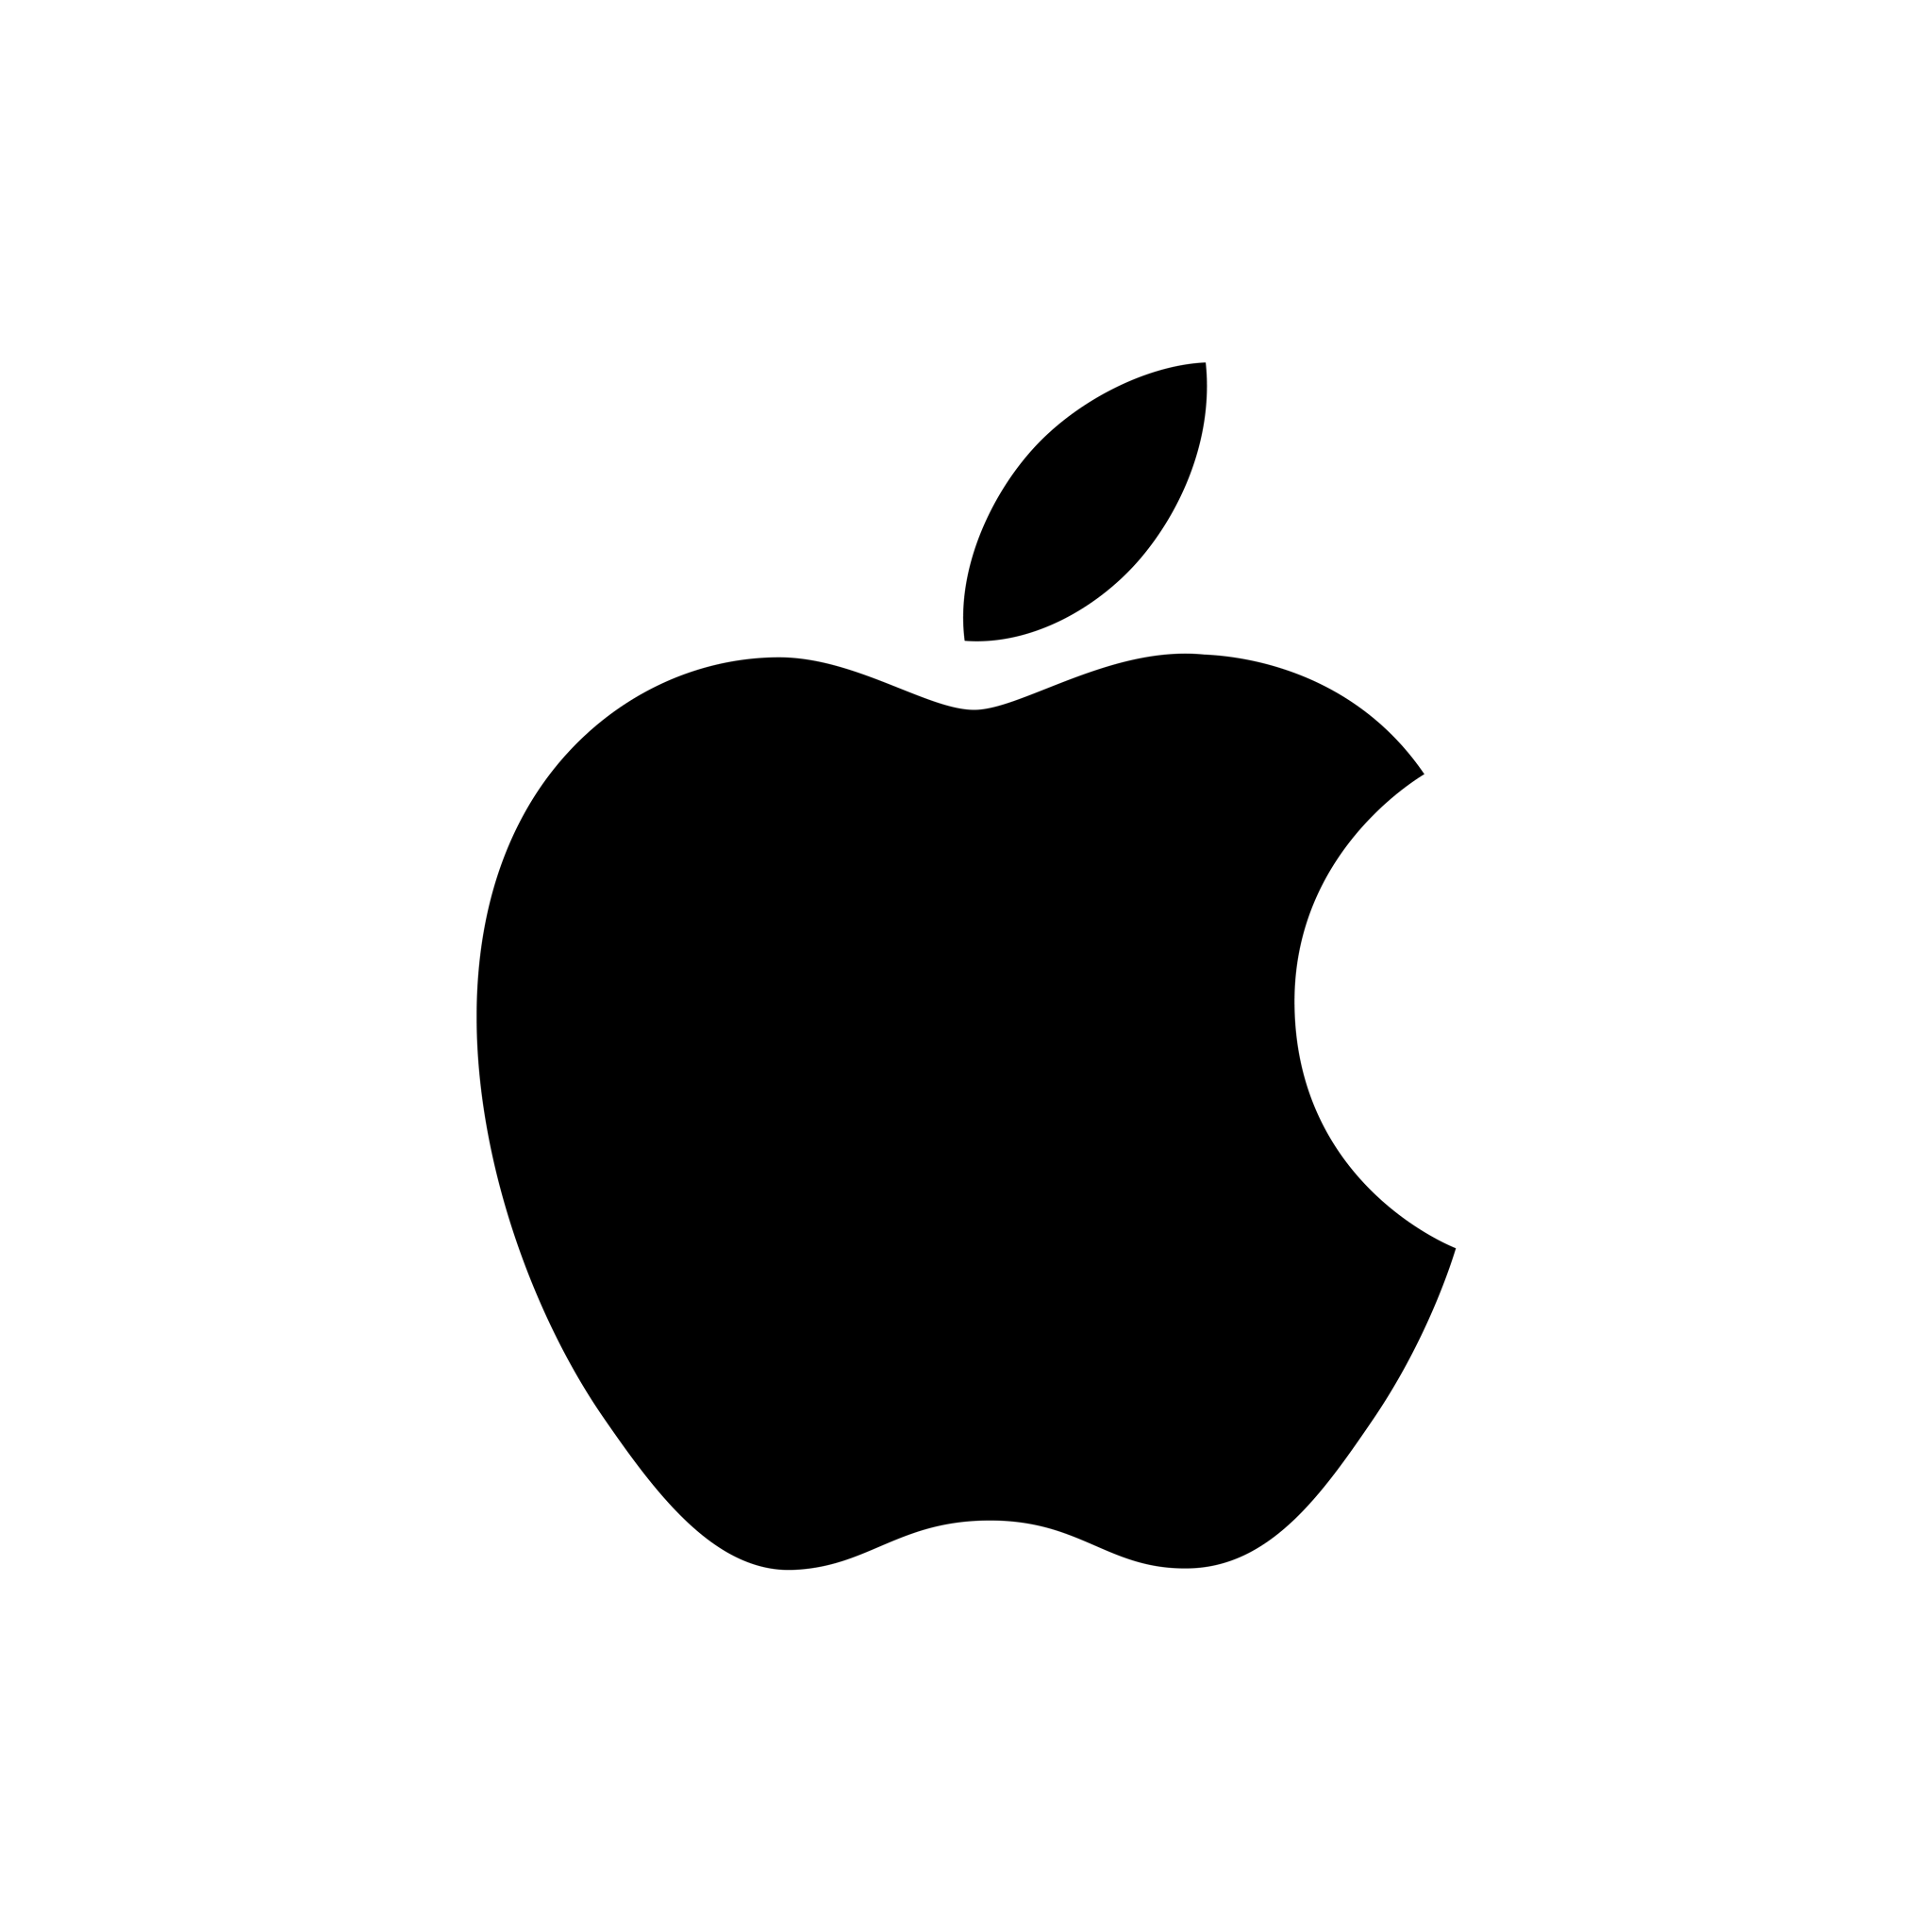 Apple icon | Icon search engine 2048 x 2048 png iconfinder ... - Retro Apple Logo